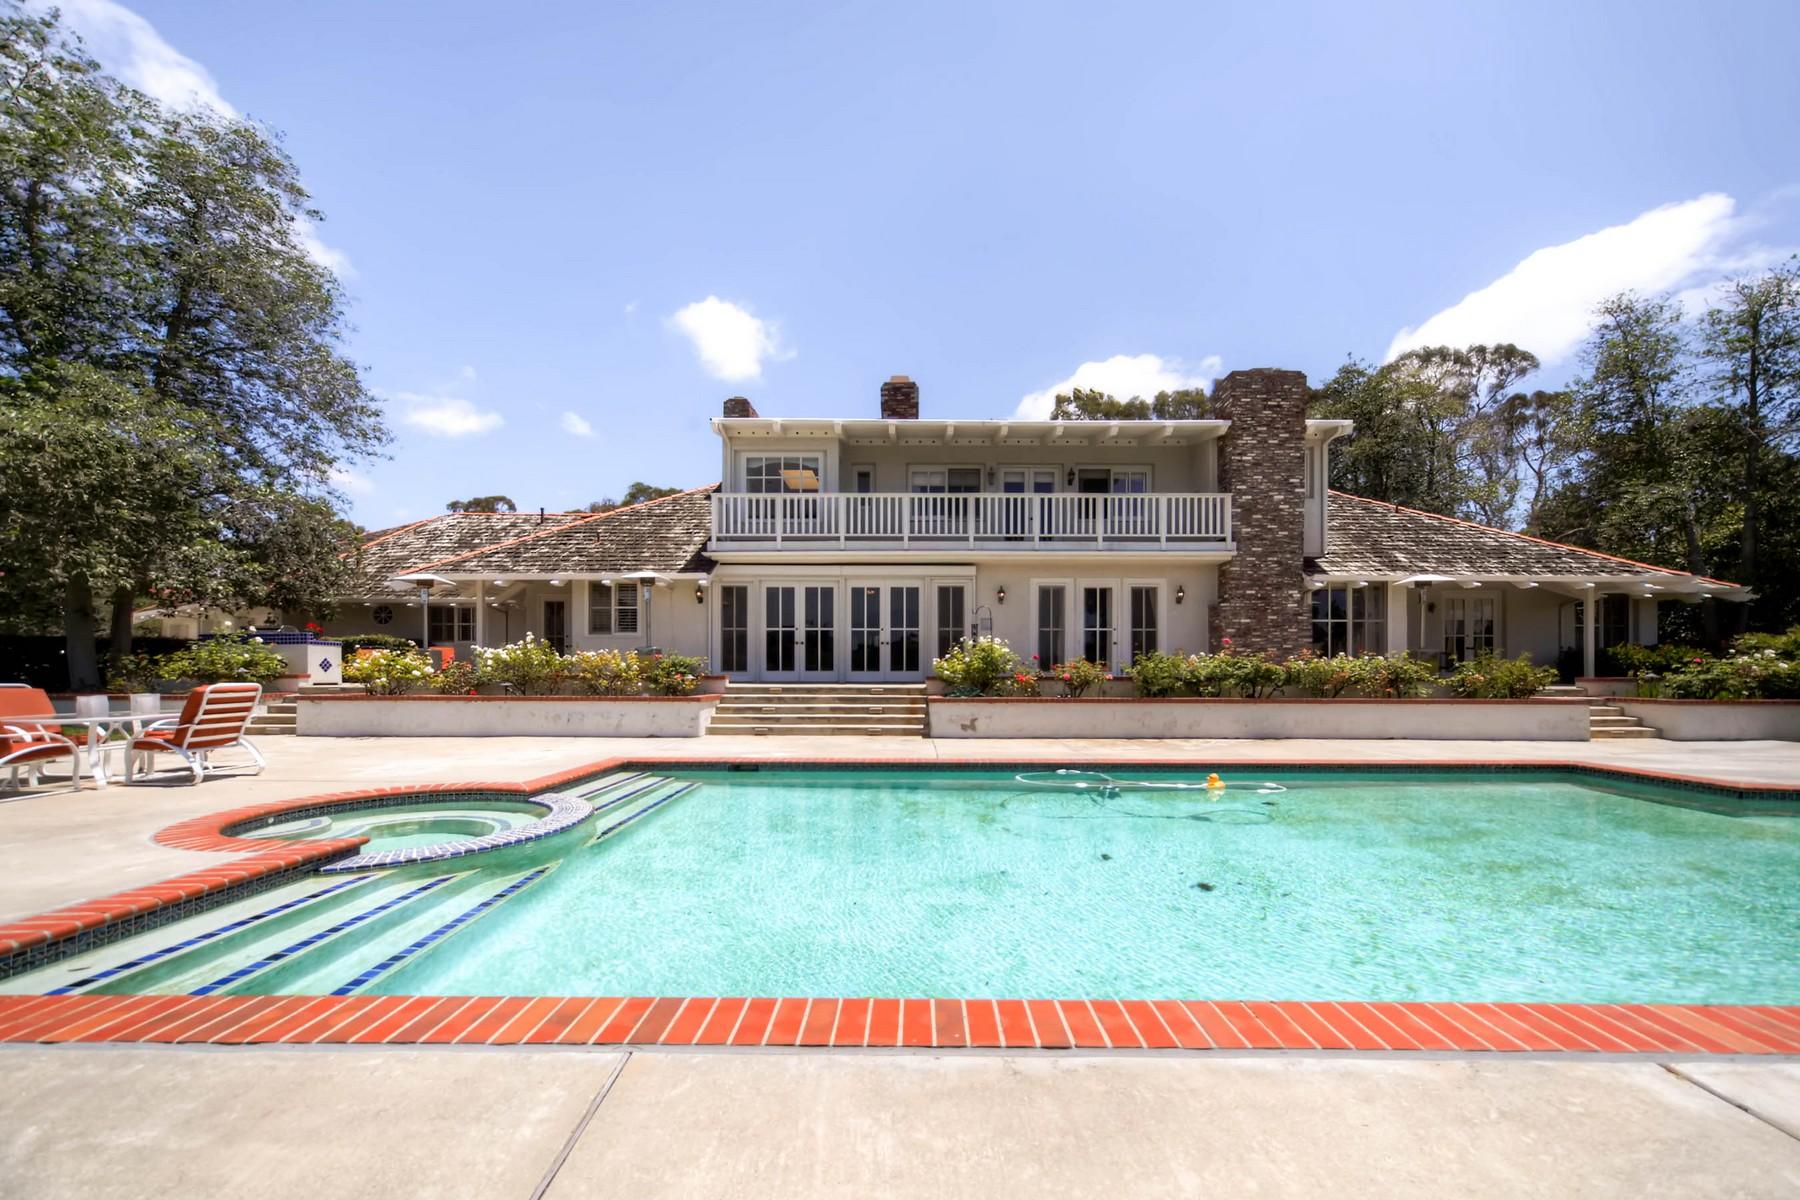 Single Family Home for Sale at 5720 Lago Lindo Rancho Santa Fe, California 92067 United States